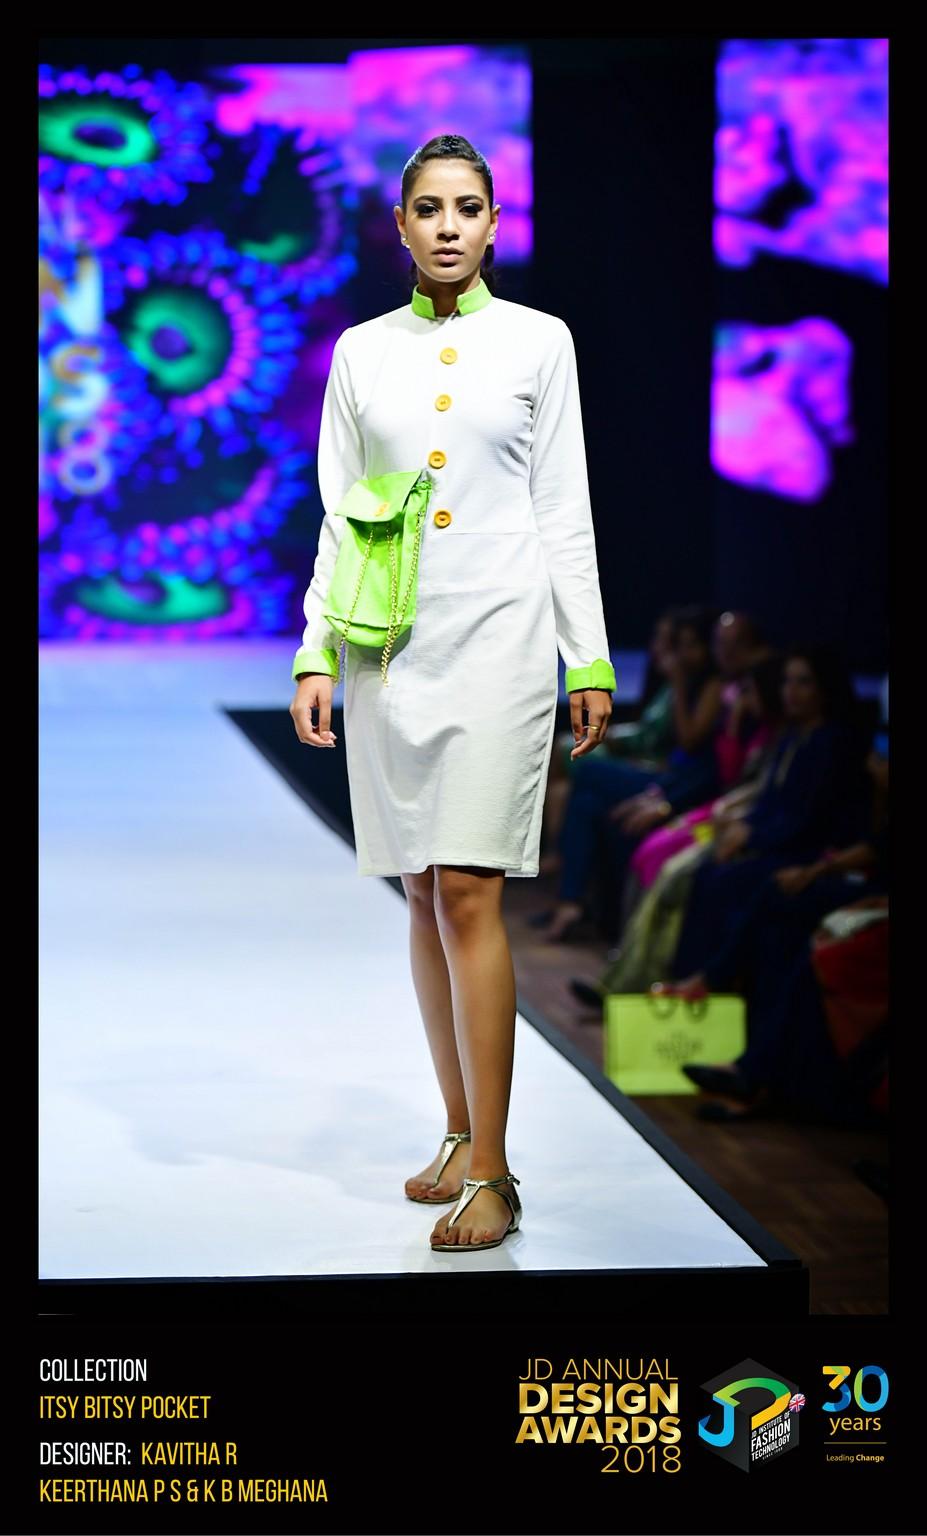 Itsy Bitsy Pocket Dress – Change – JD Annual Design Awards 2018   Designer: Kavitha, Keertana and Meghana   Photography : Jerin Nath (@jerin_nath) itsy bitsy pocket dress - ITSY BITSY POCKET2 - Itsy Bitsy Pocket Dress – Change – JD Annual Design Awards 2018